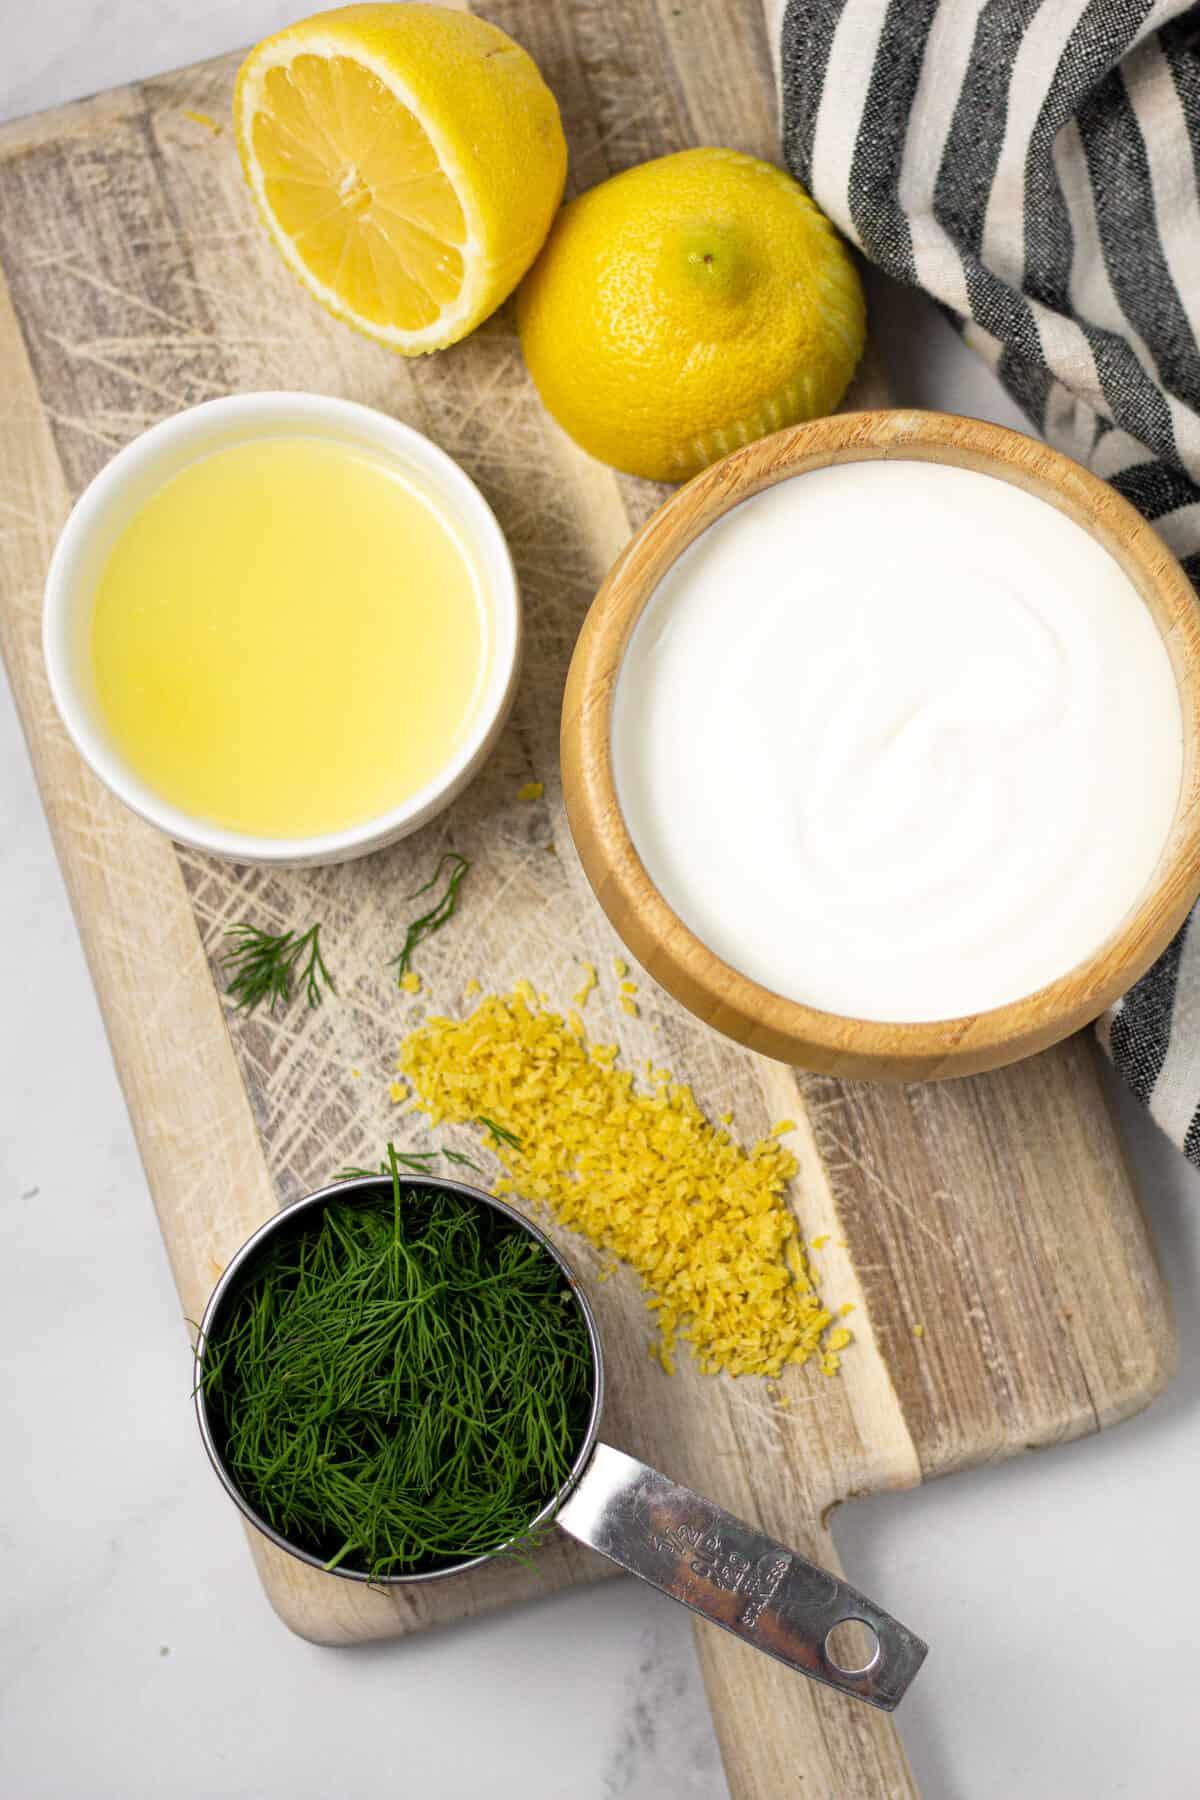 Overhead shot of ingredients to make homemade yogurt sauce